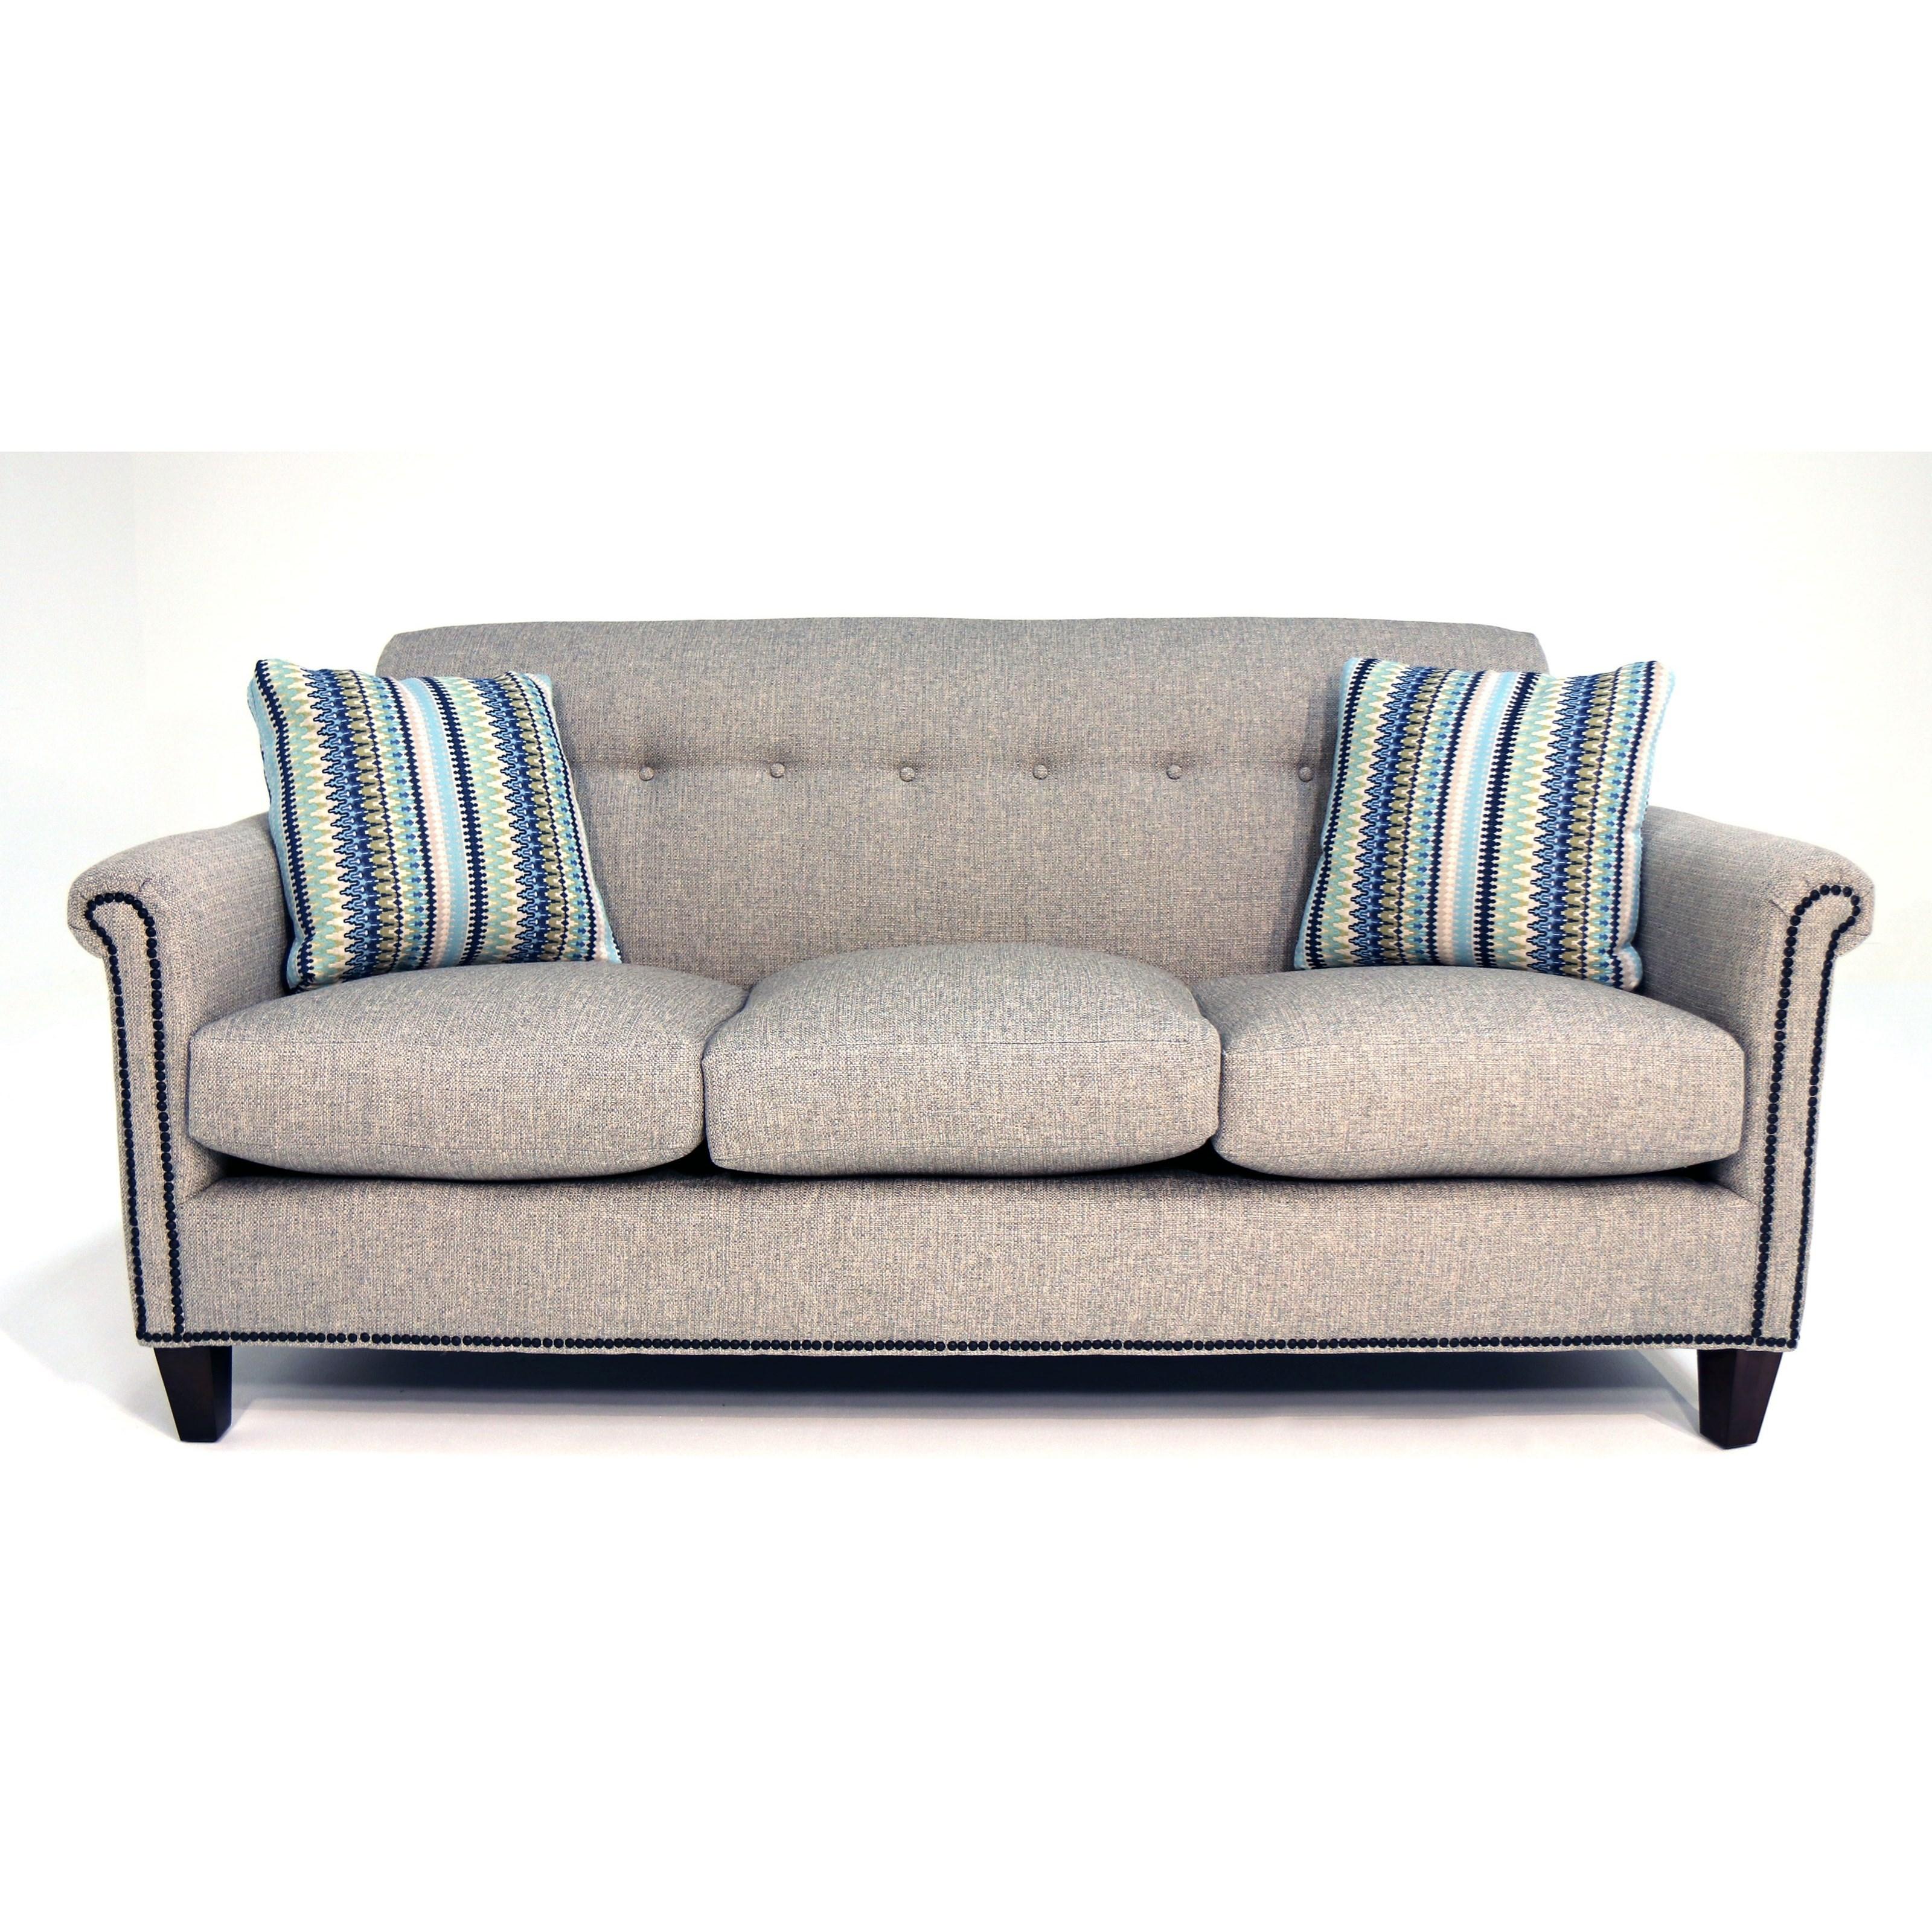 Modern Select Apartment Sofa by Kincaid Furniture at Johnny Janosik